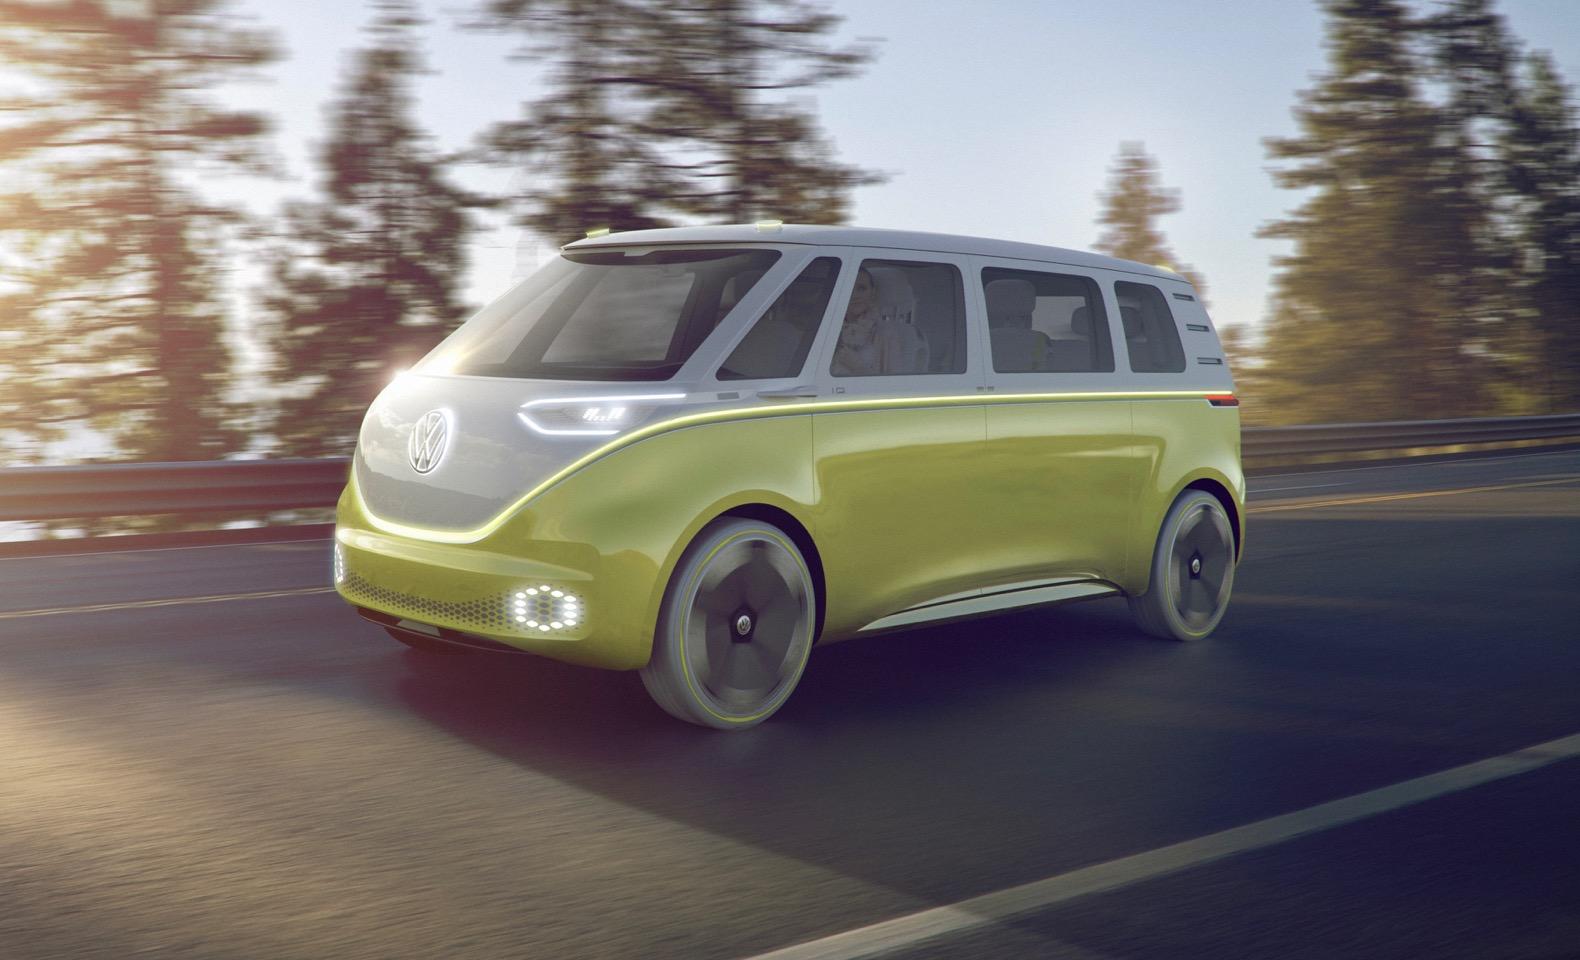 H Volkswagen ποντάρει στο μέλλον των ηλεκτρικών οχημάτων